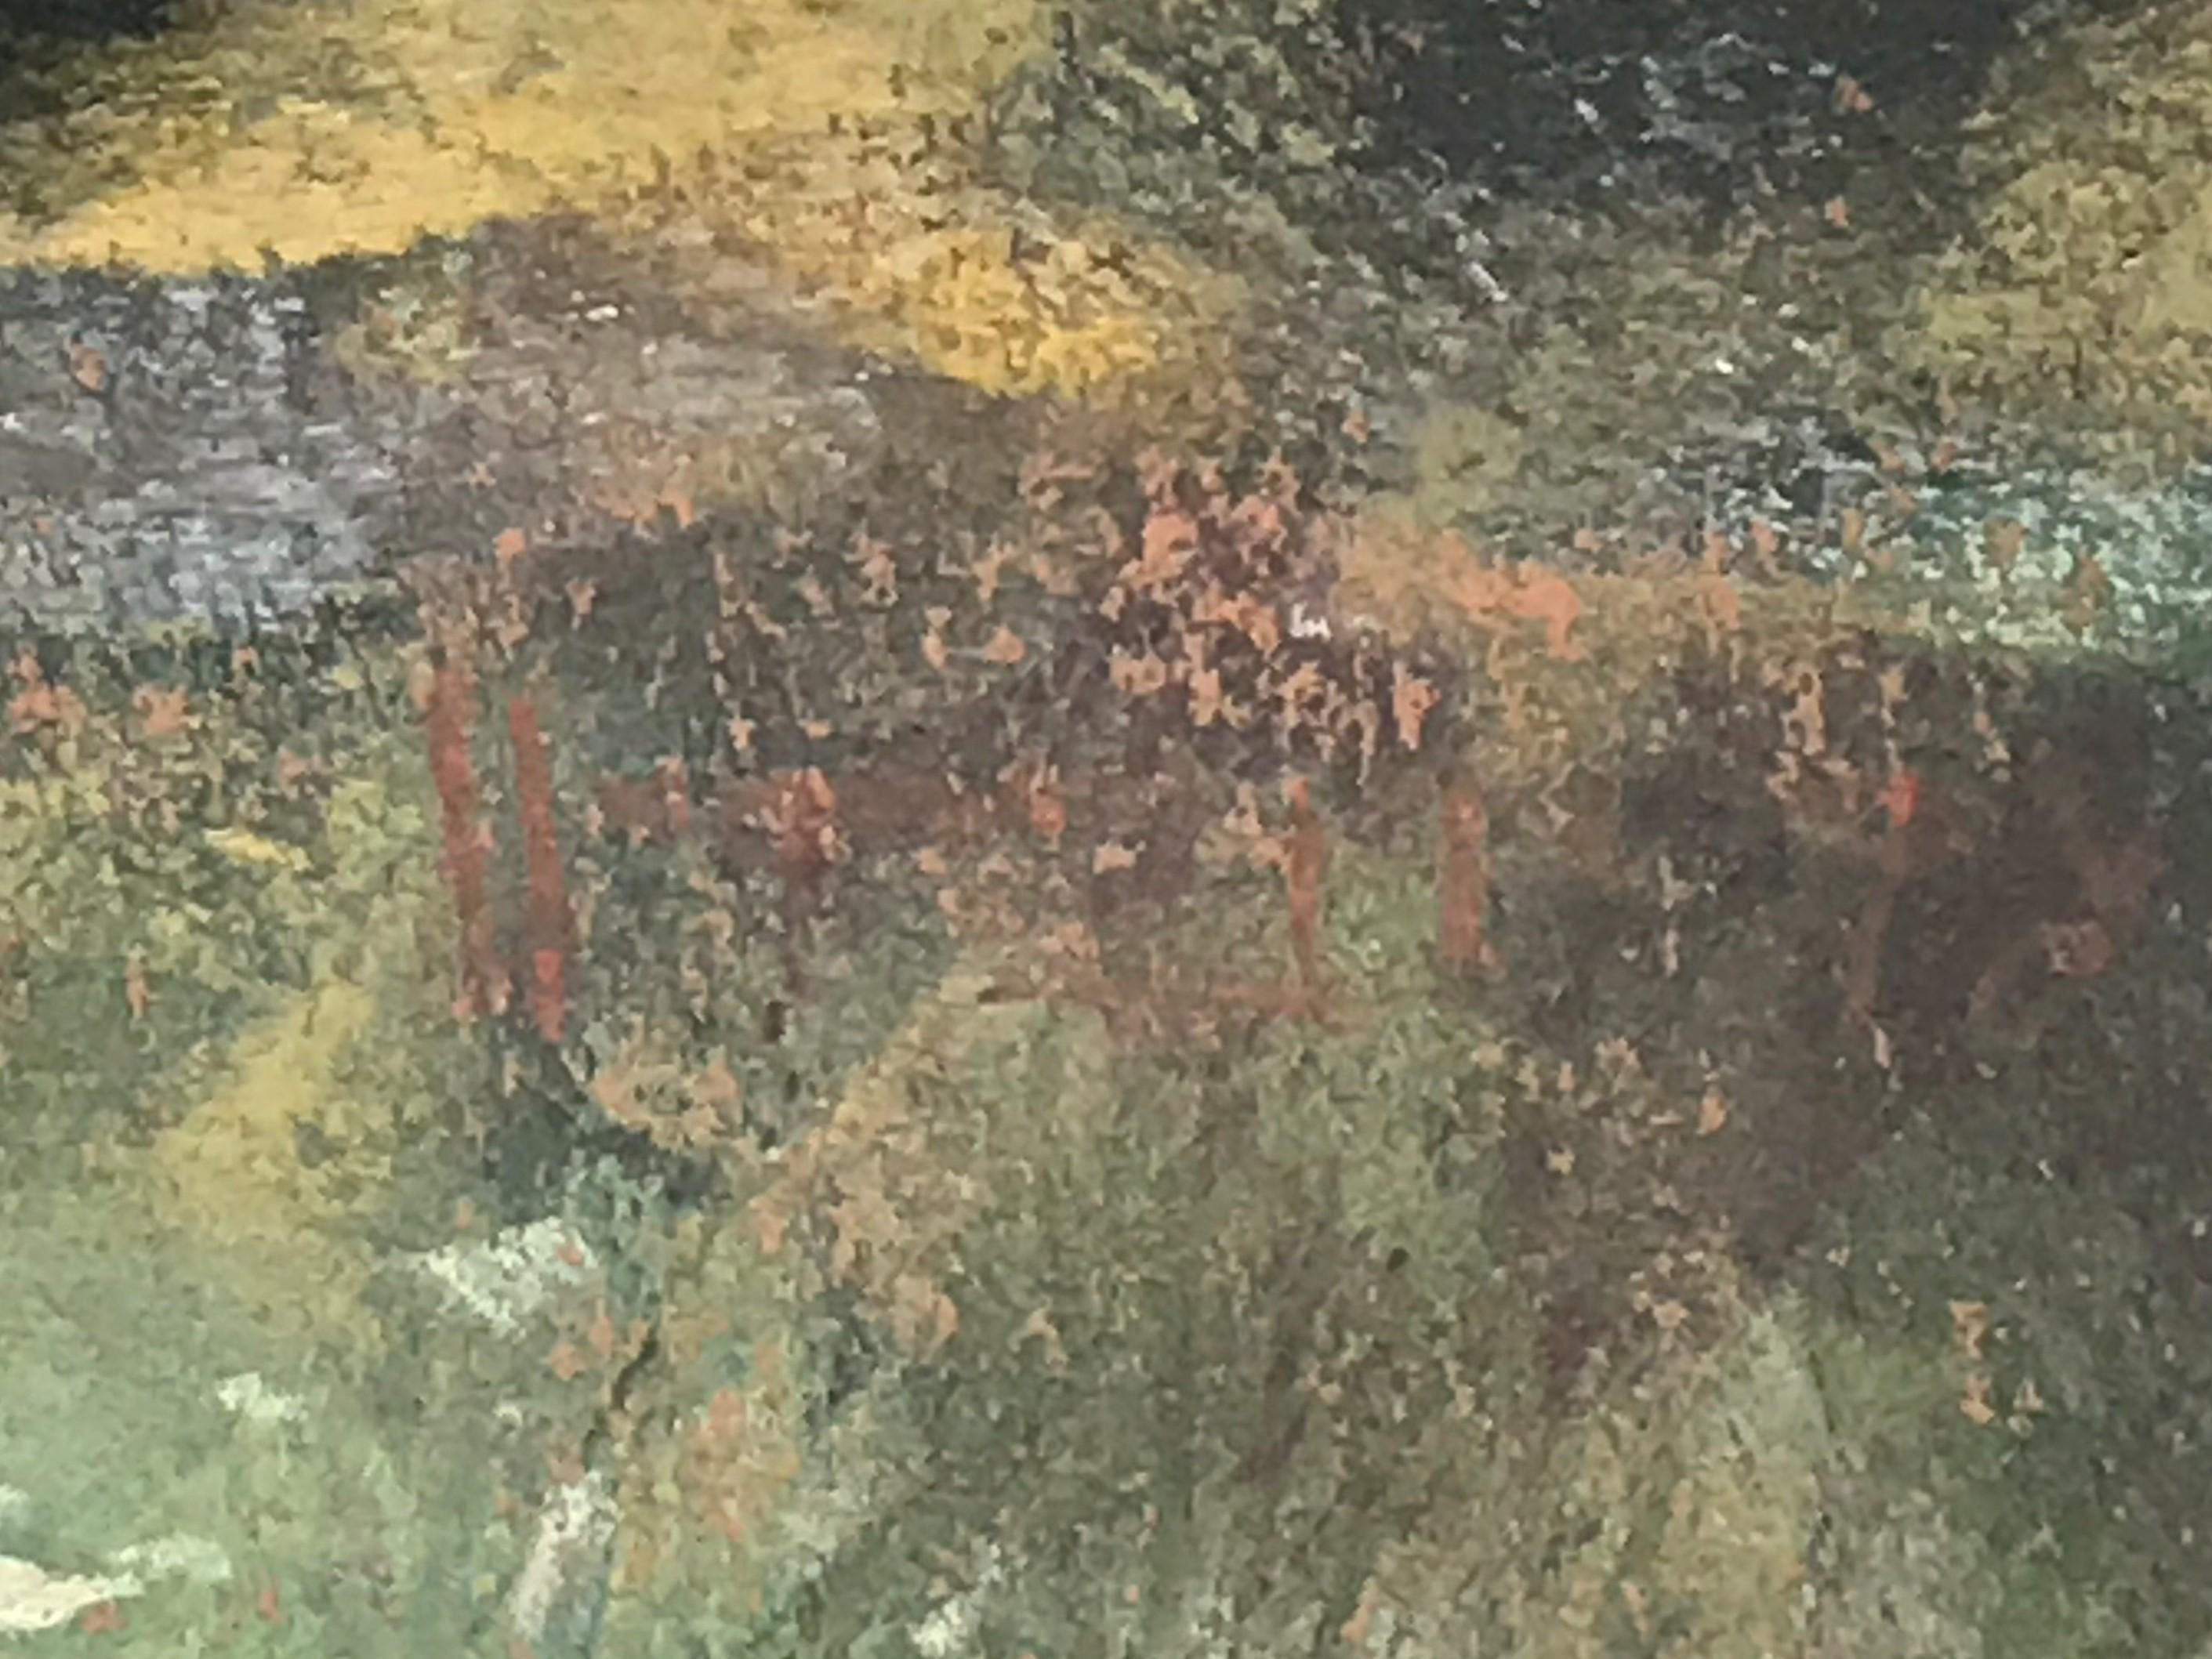 Forrest Stream in Dappled Sun pastel by Scottish artist Robert Turnbull 20th C - Image 4 of 4